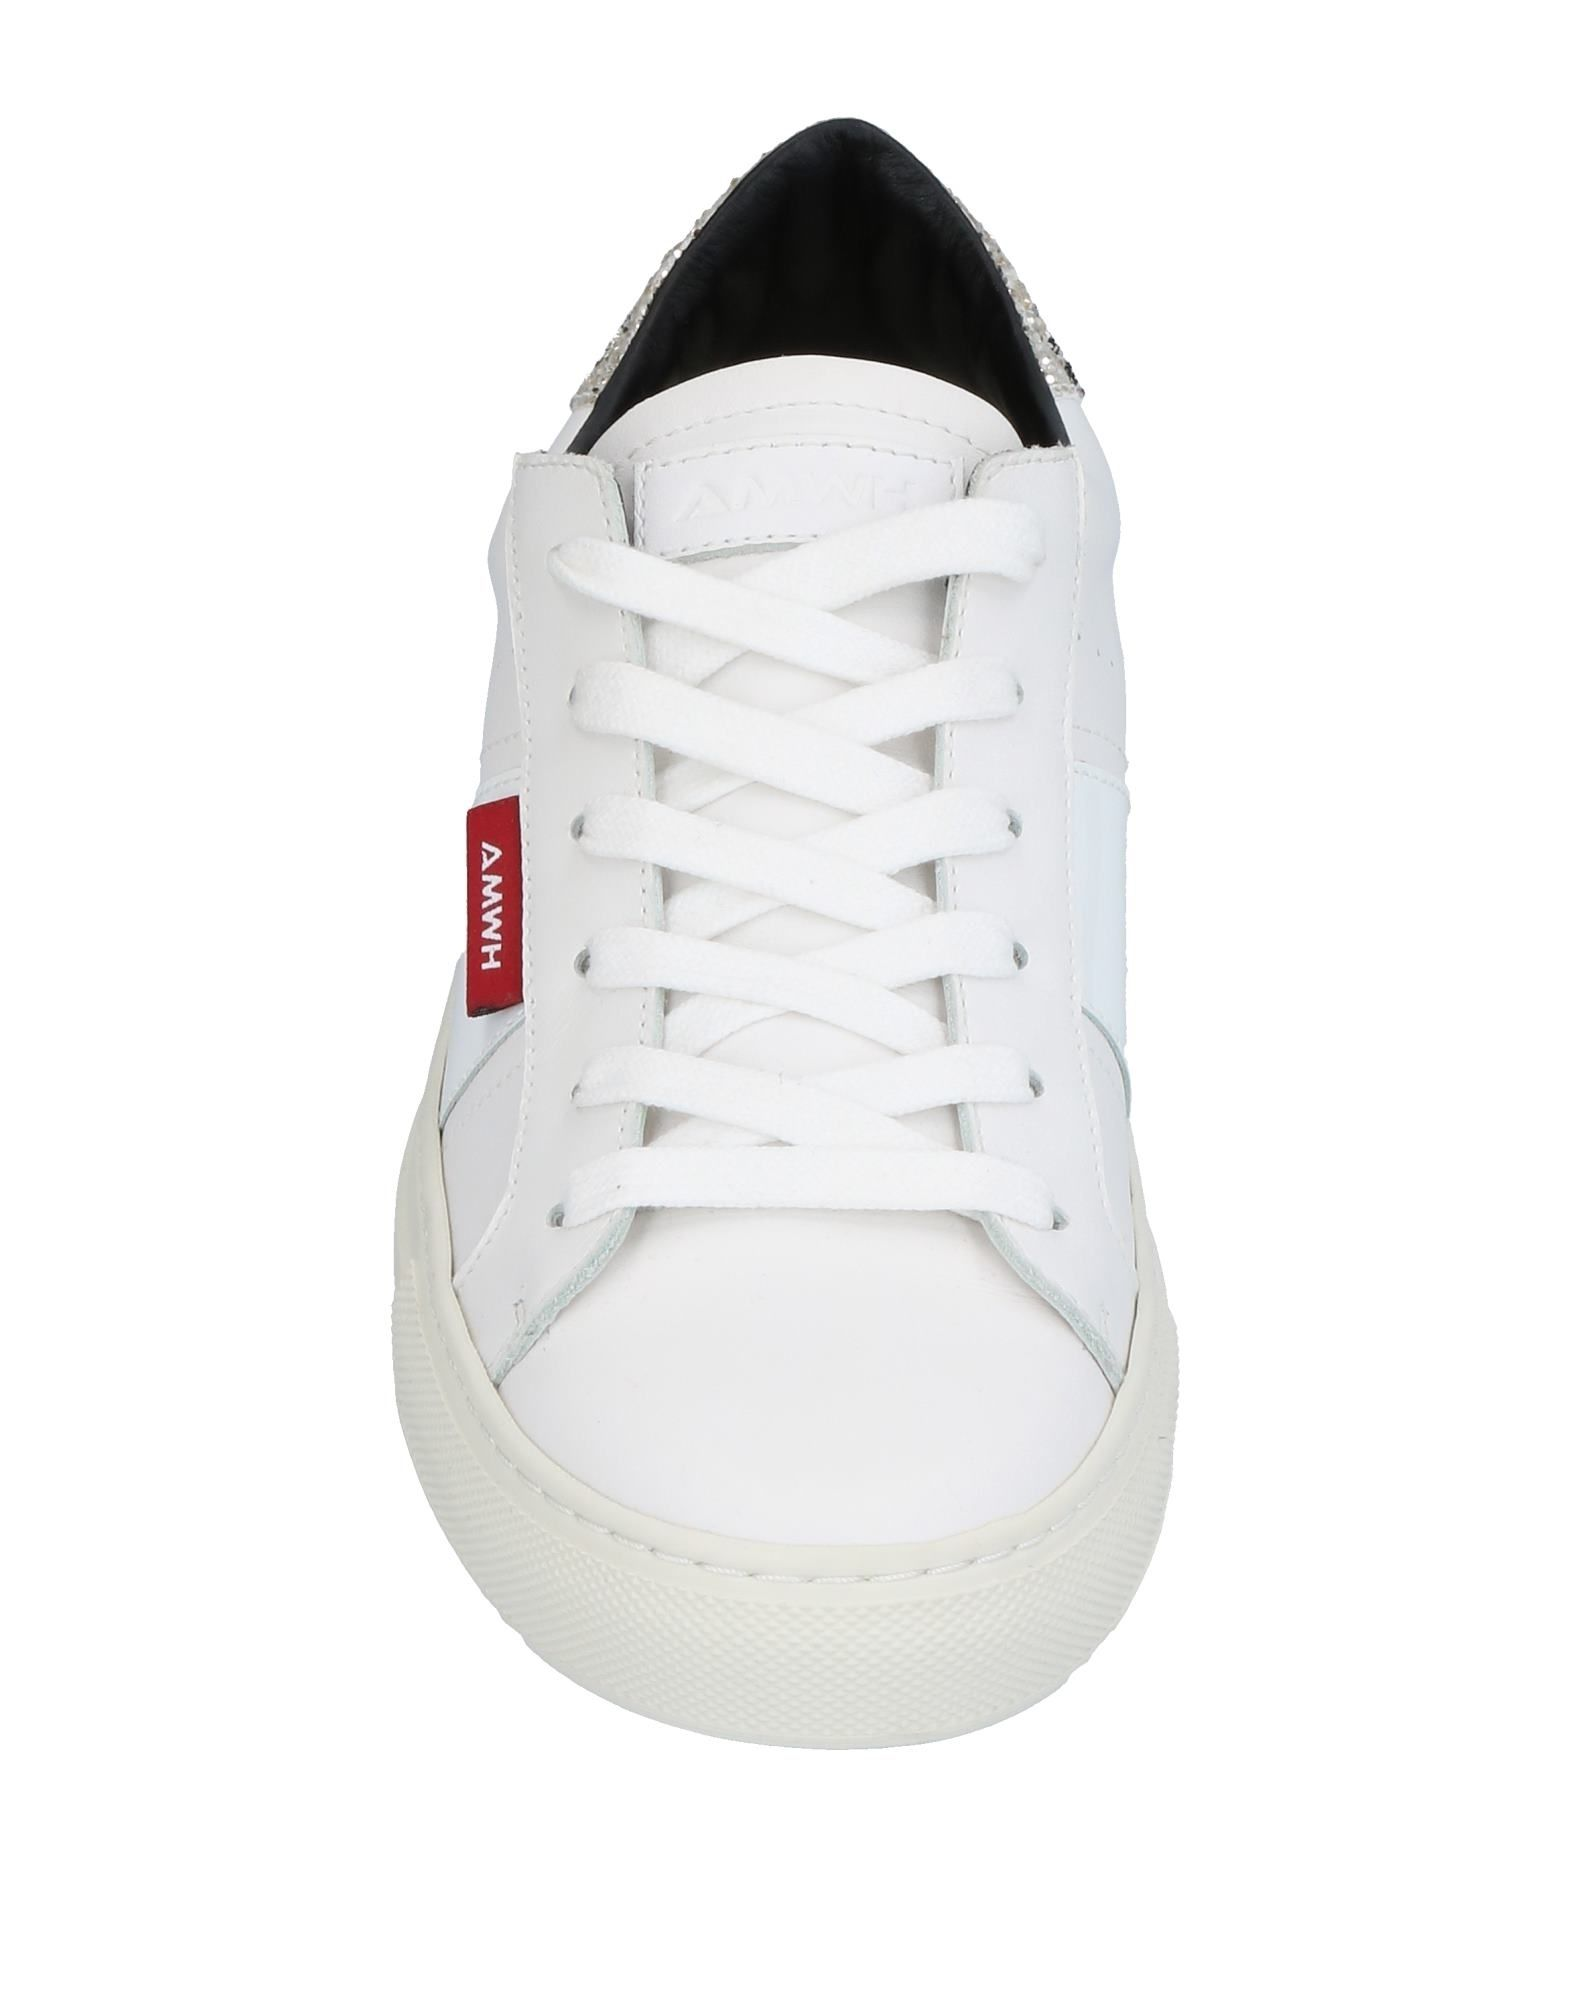 Amwh Sneakers Damen  11368016DW Schuhe Gute Qualität beliebte Schuhe 11368016DW 51b4f3